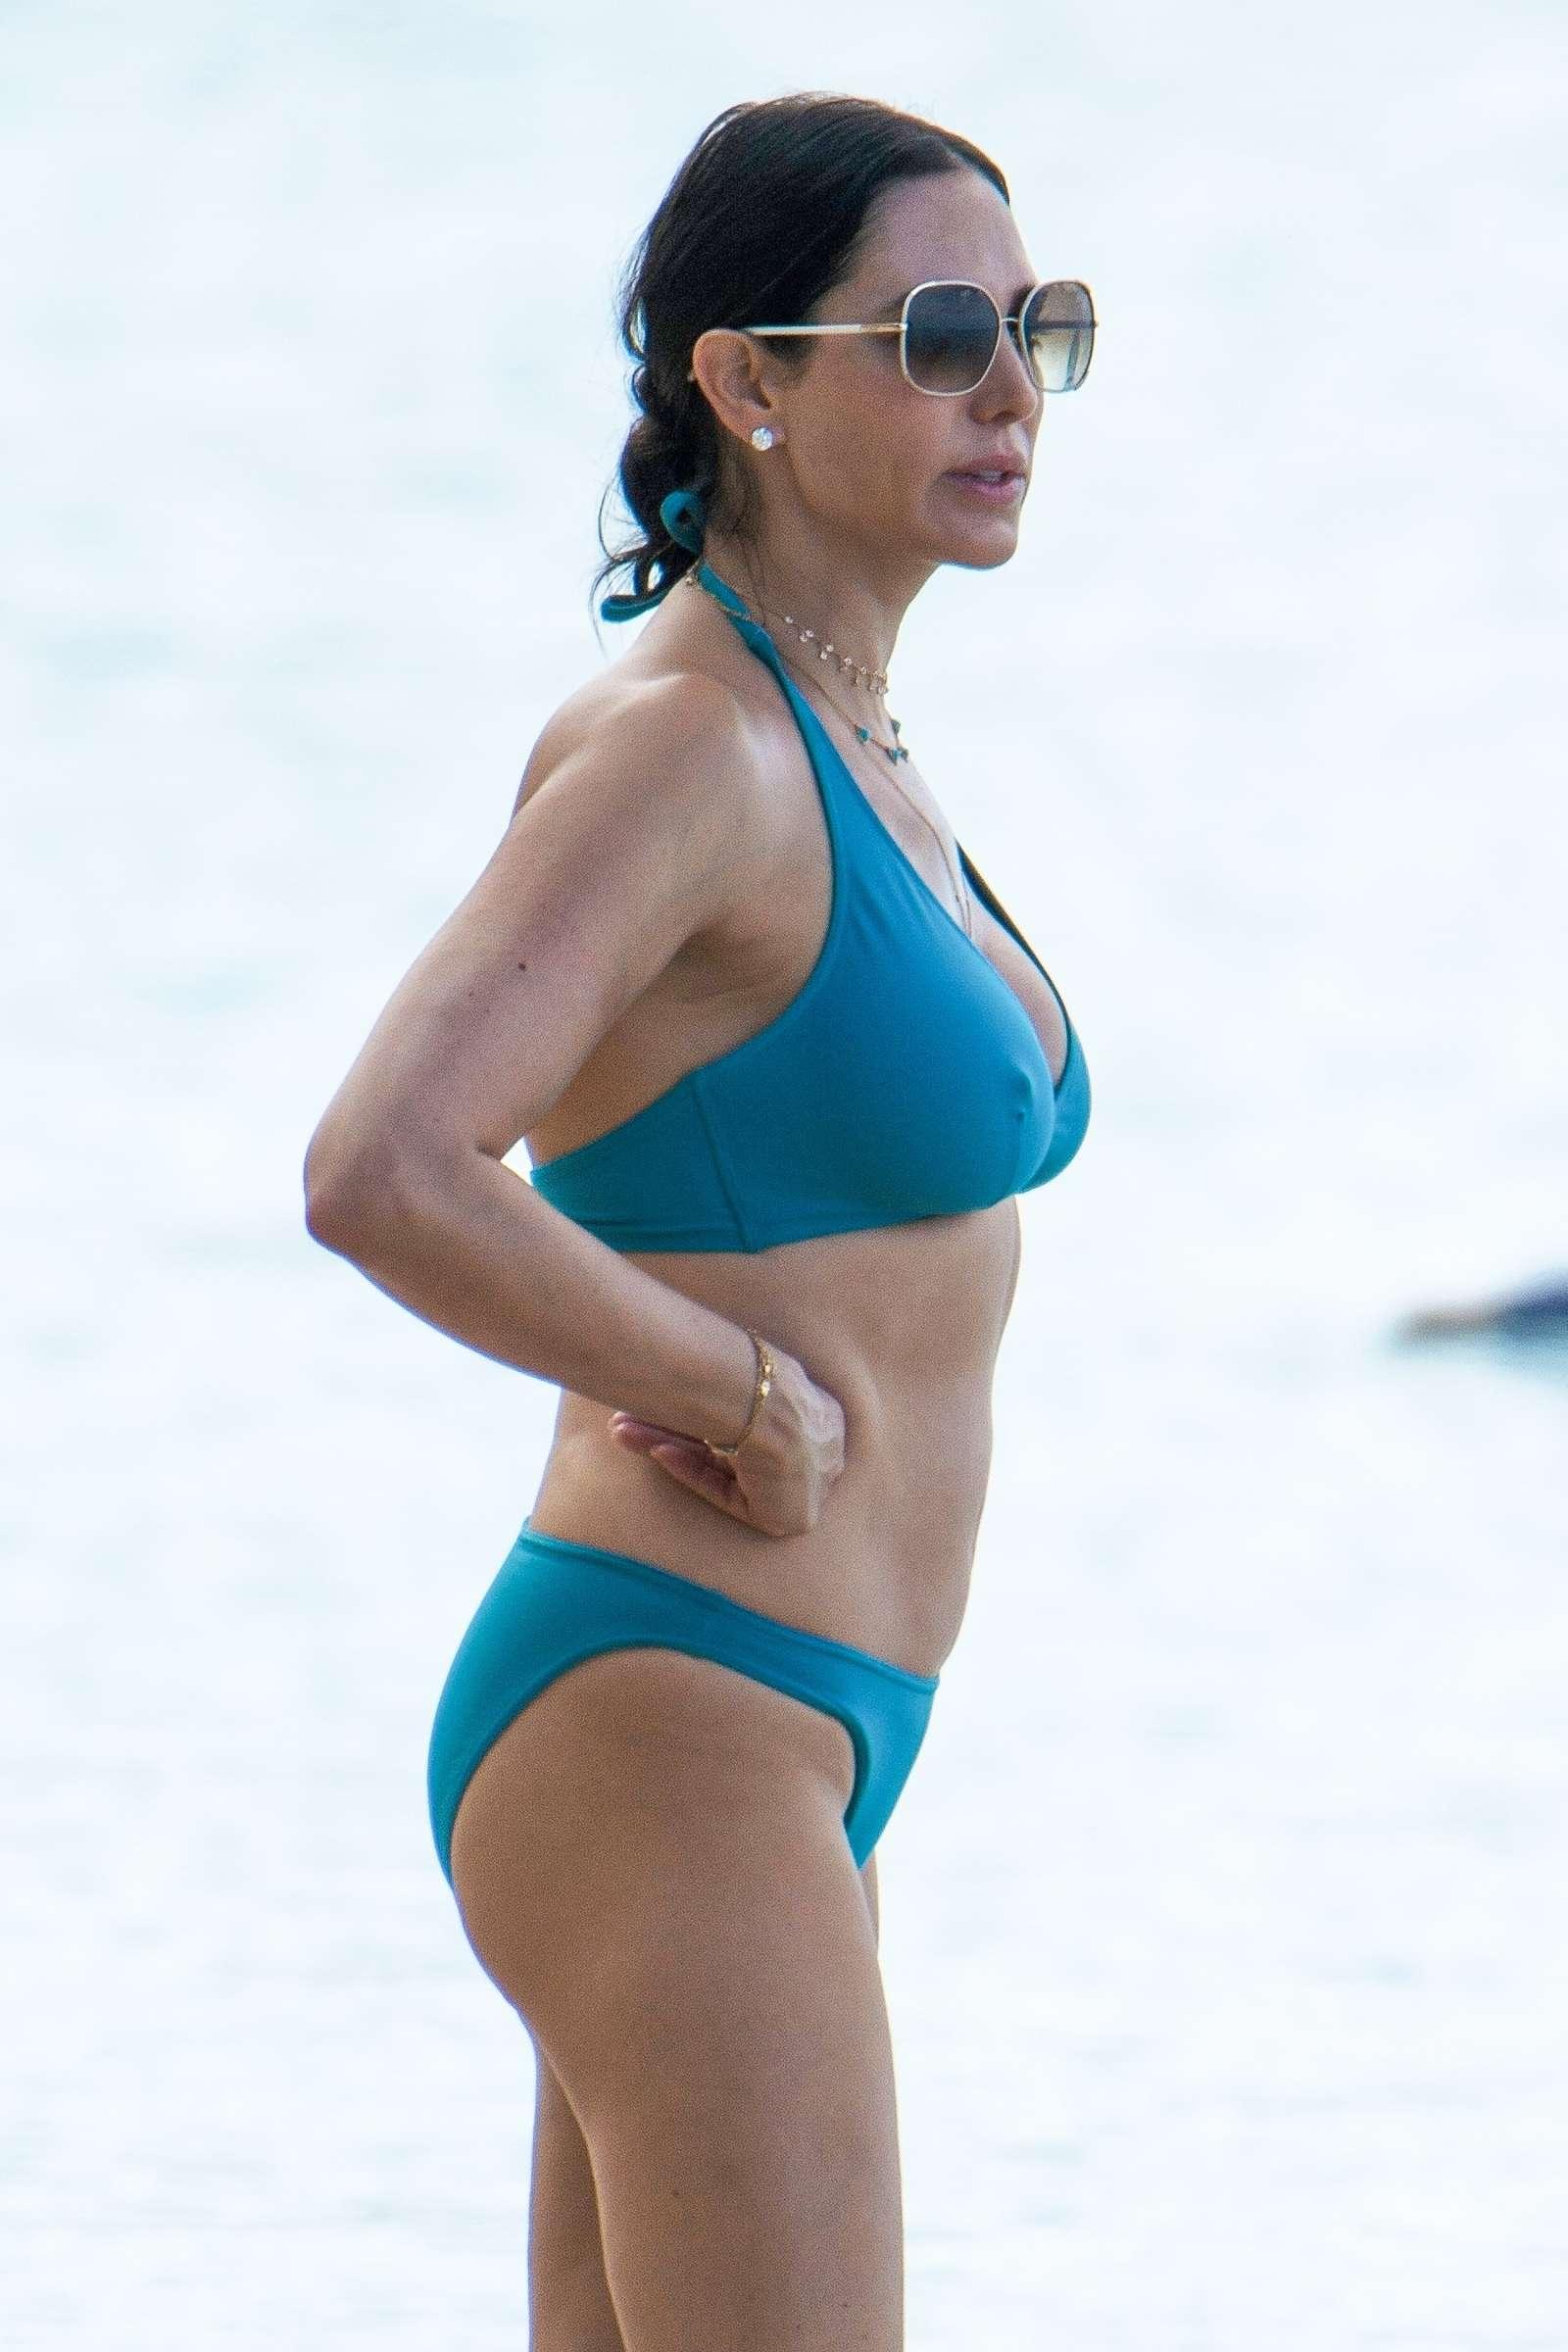 Lauren Silverman in Blue Bikini on the beach in Barbados